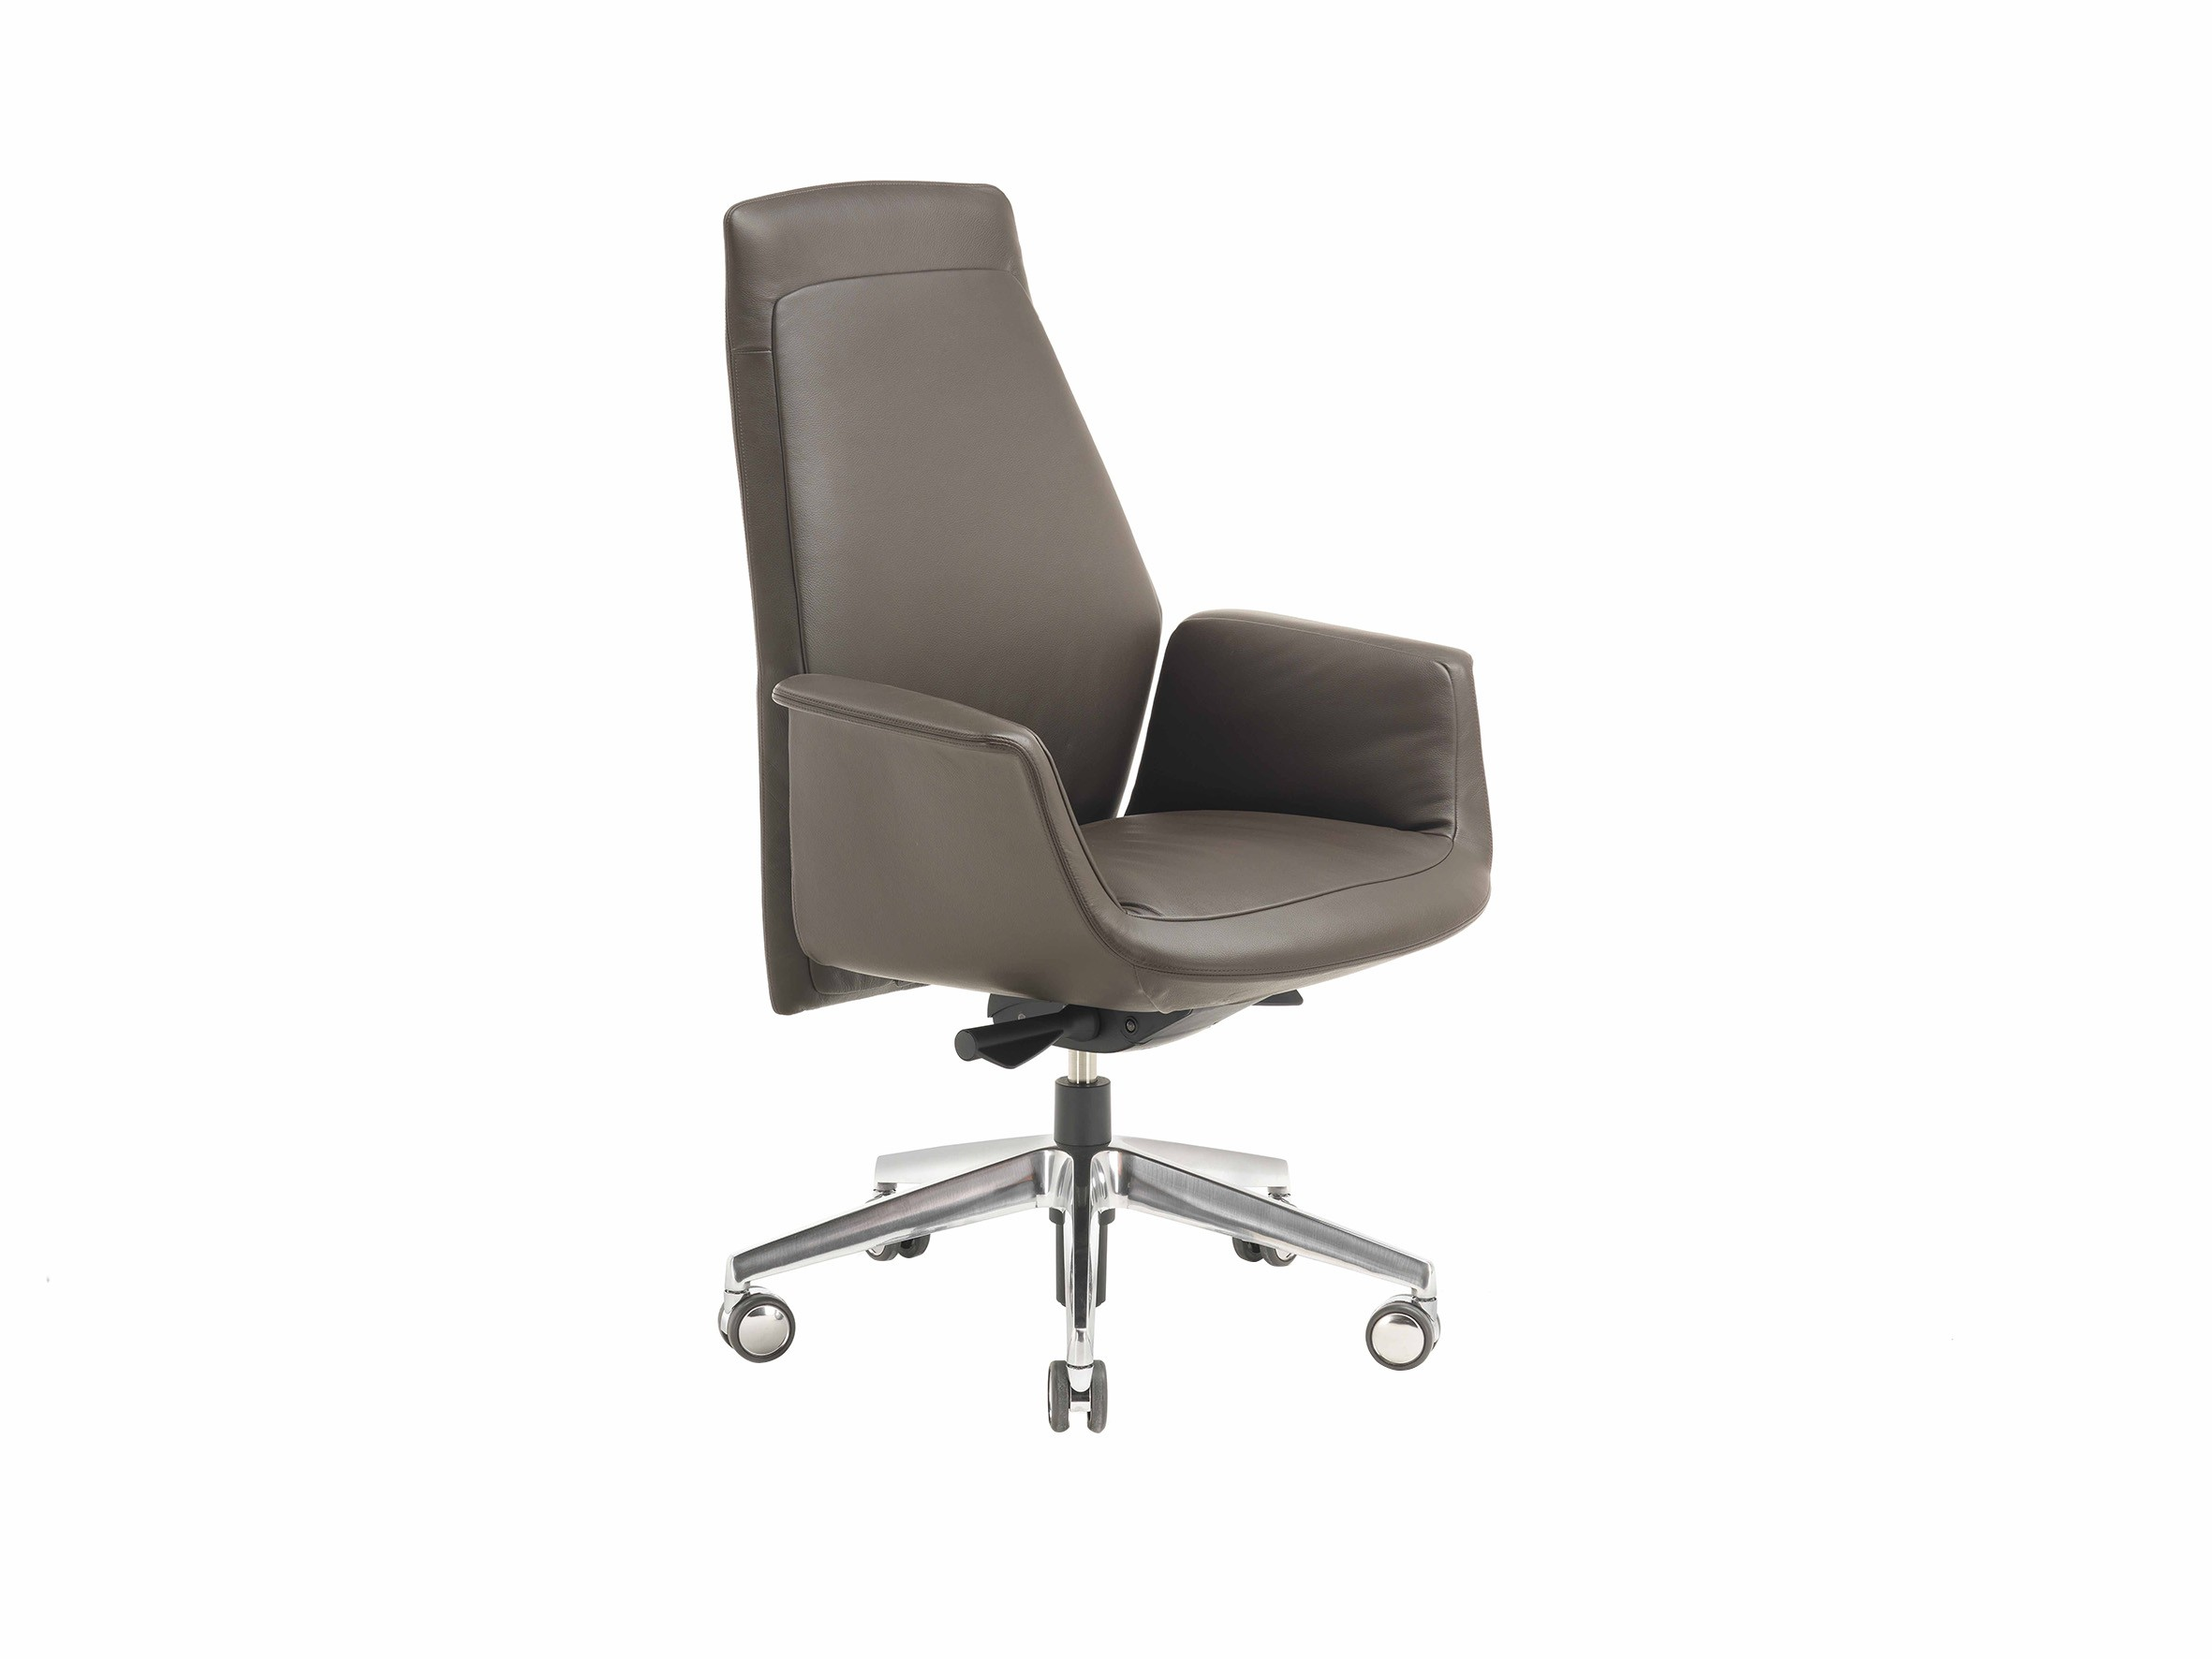 poltrona frau downtown executive armchair. Black Bedroom Furniture Sets. Home Design Ideas